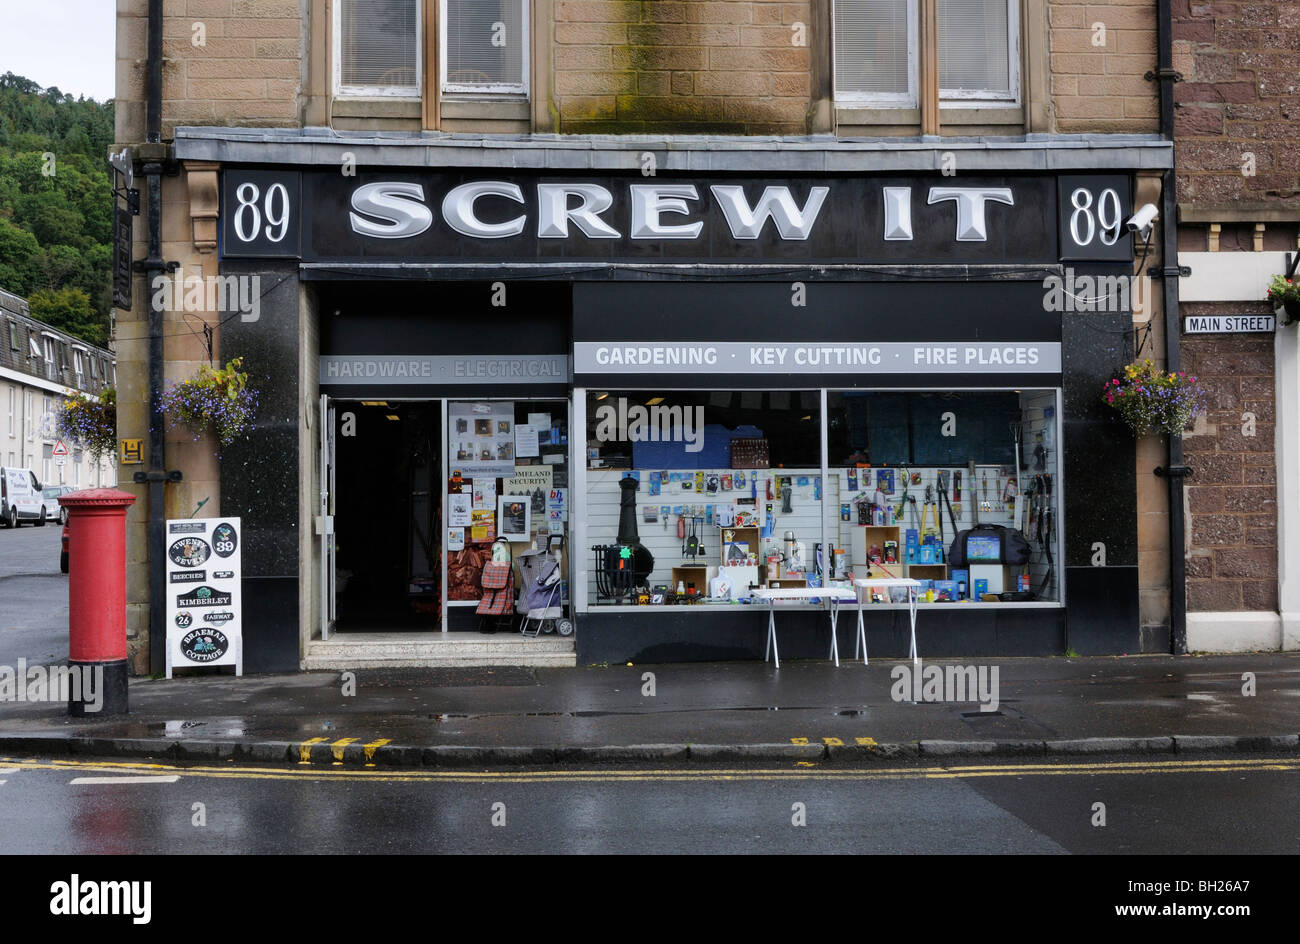 main image screw. Main Image Screw